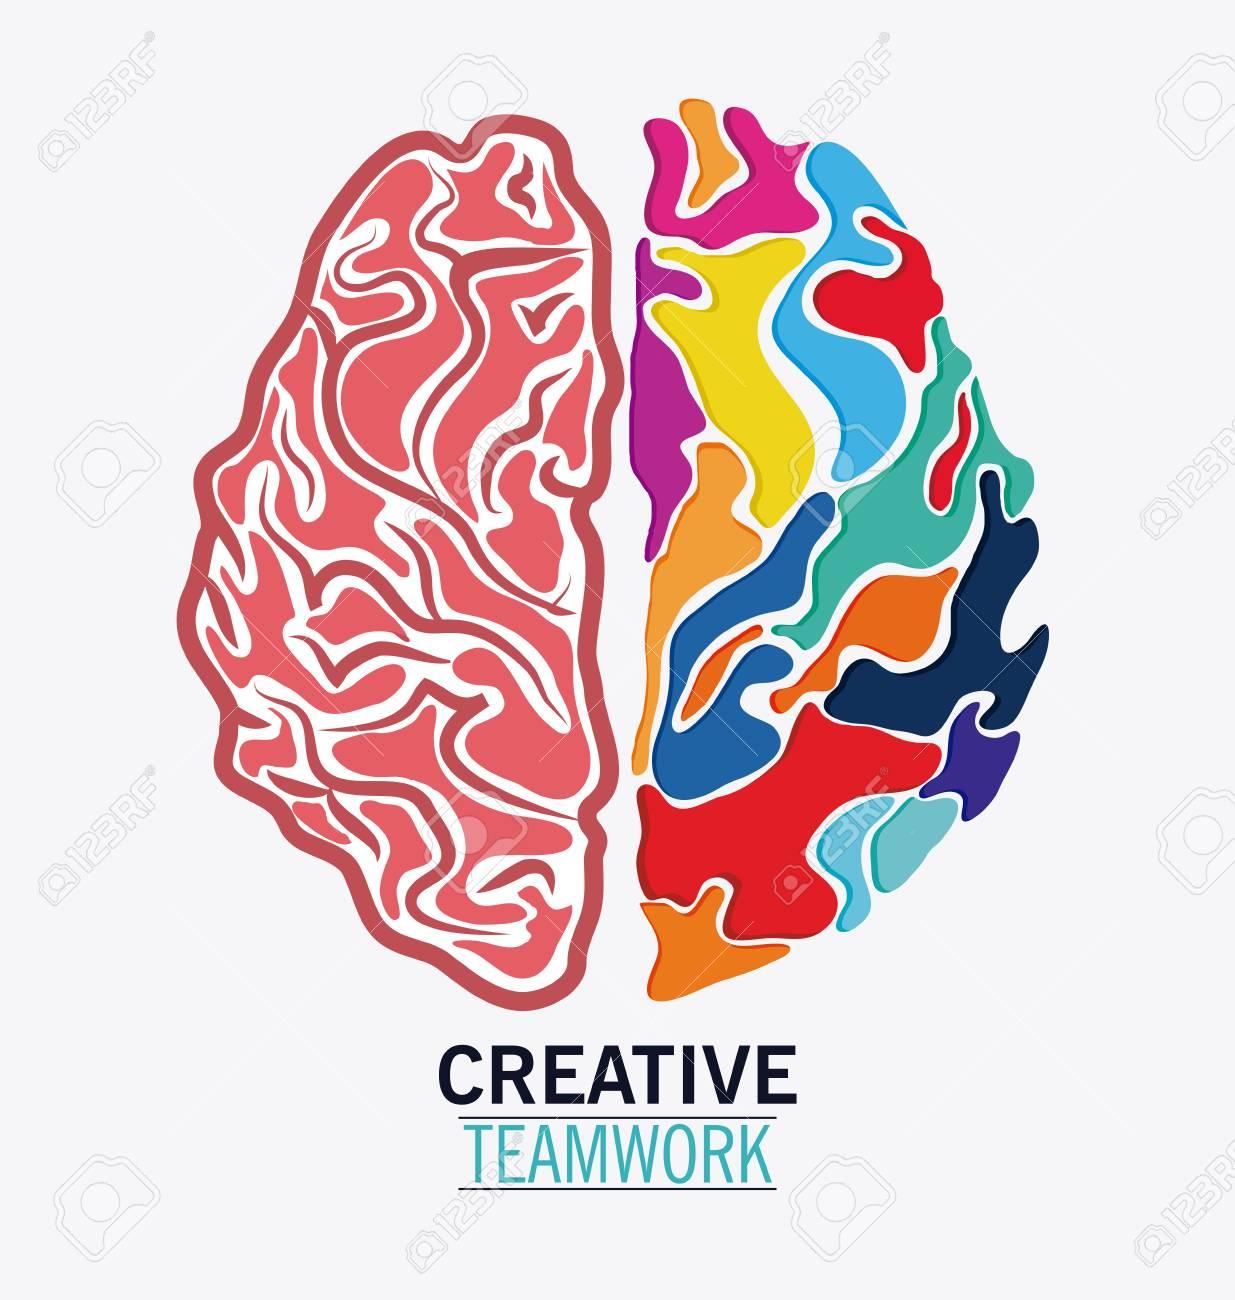 brain icon creative teamwork and big idea theme colorful and